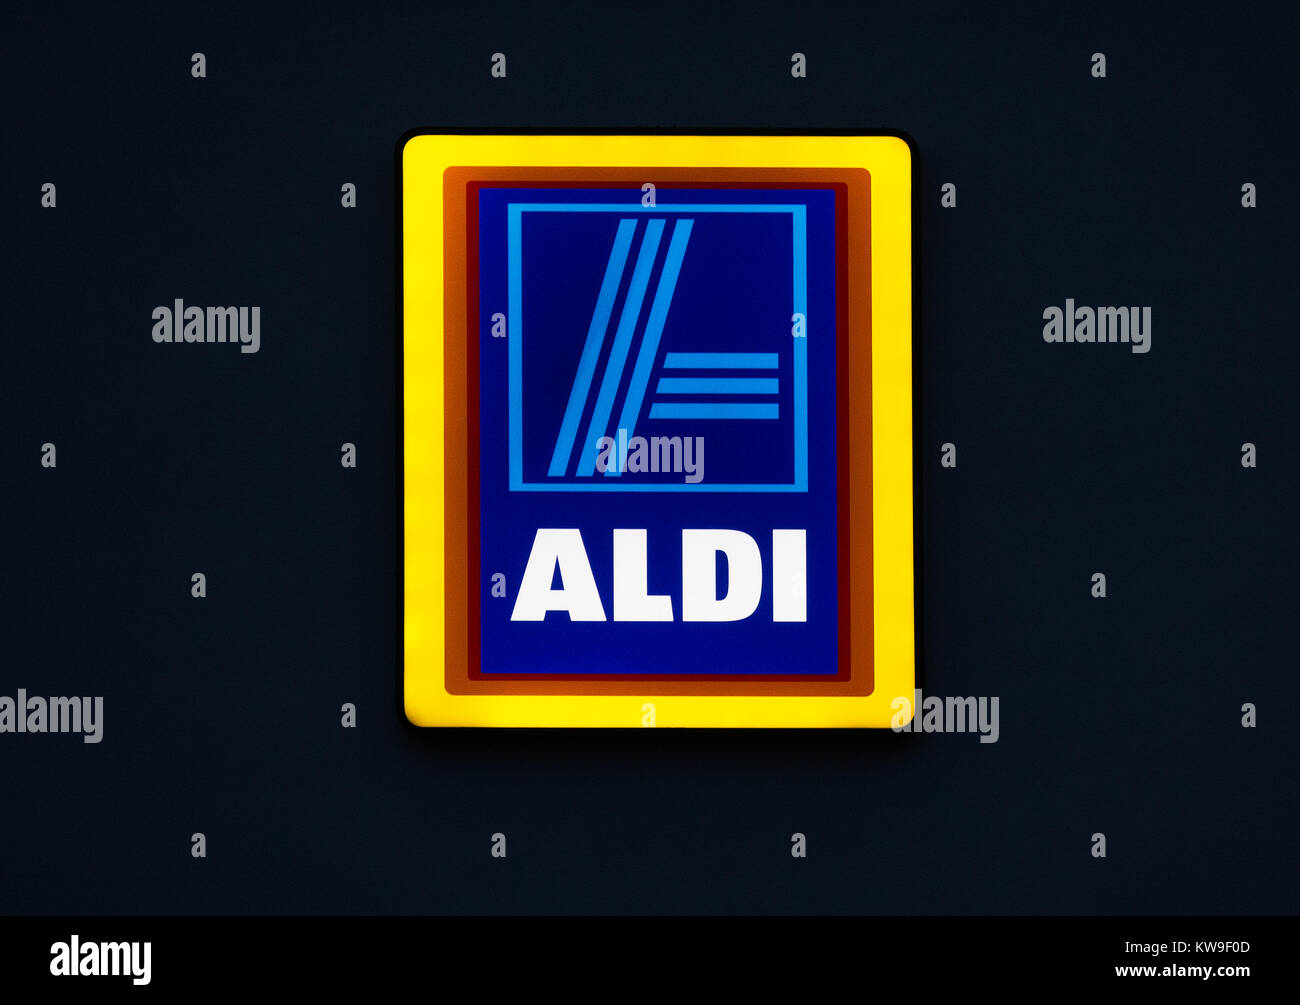 aldi store sign company logo neon light - Stock Image